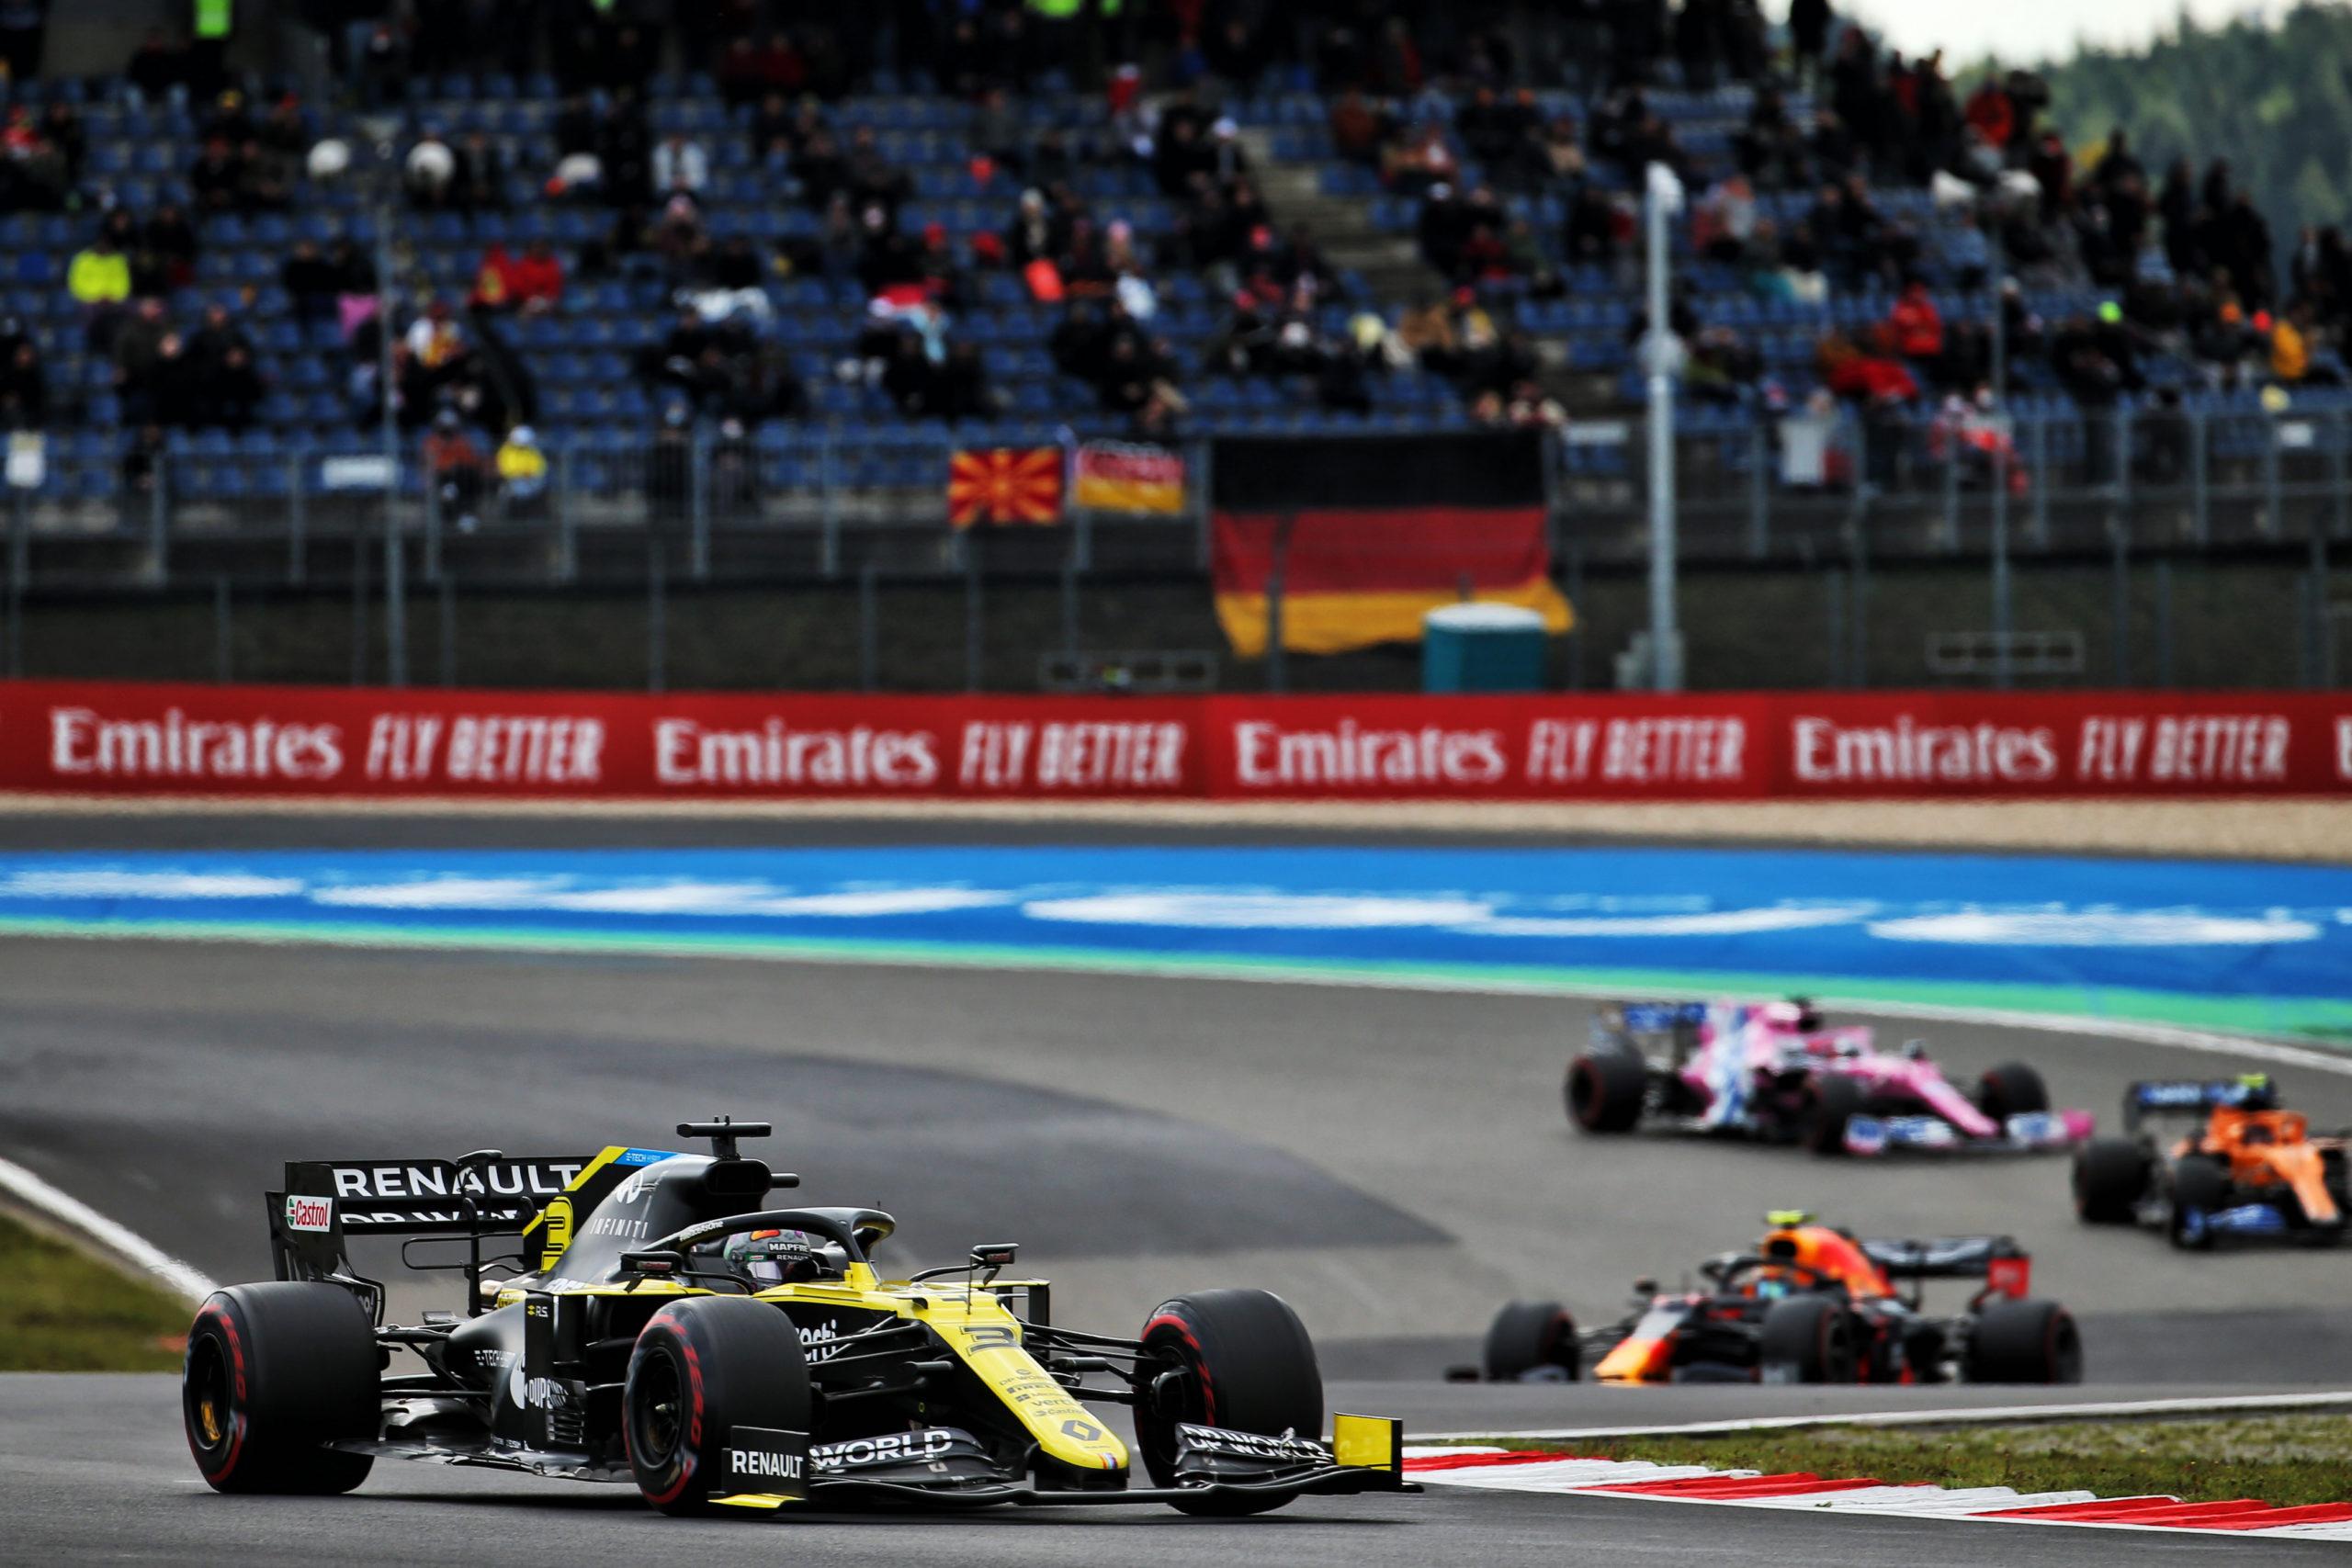 Daniel Ricciardo (AUS) Renault F1 Team RS20. Eifel Grand Prix, Sunday 11th October 2020. Nurbugring, Germany.